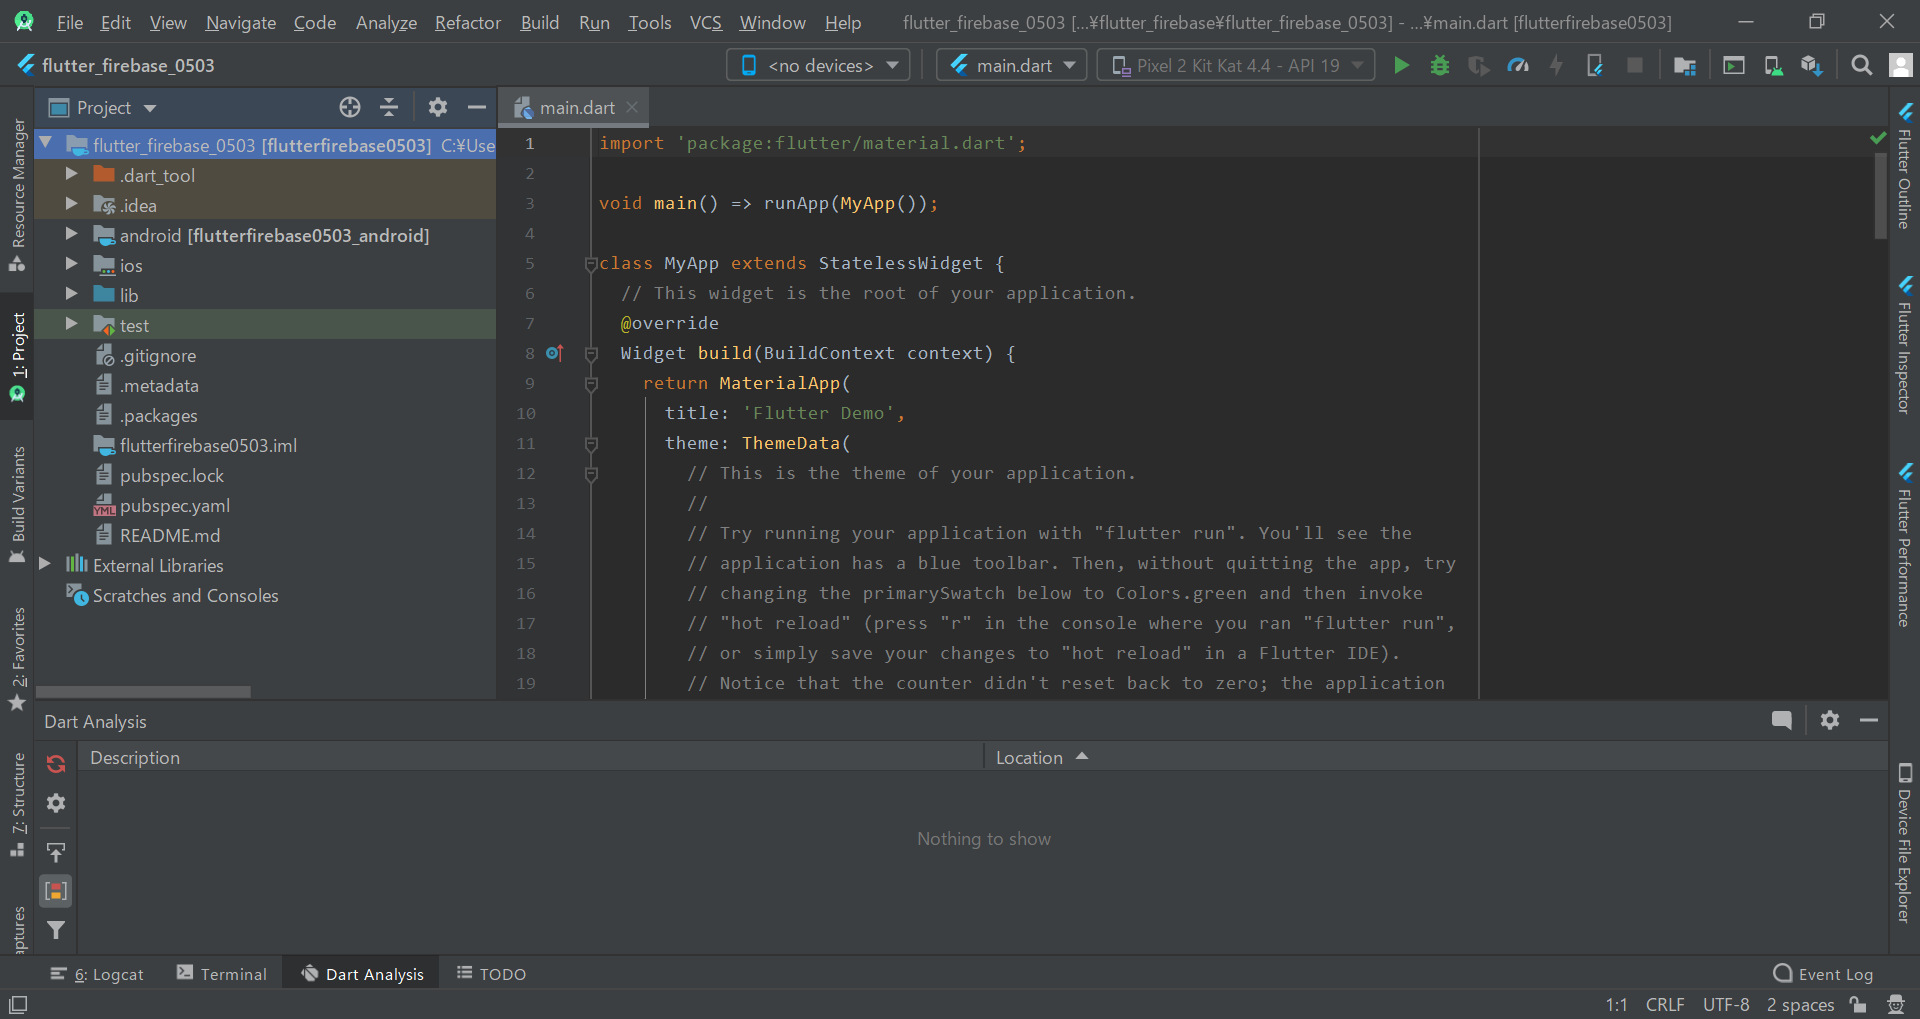 flutter_firebase_0503 [C__Users_kami_teru_source_repos_flutter_firebase_flutter_firebase_0503] - ..._lib_main.dart [flutterfirebase0503] - Android Studio 2020_05_03 14_32_08.png